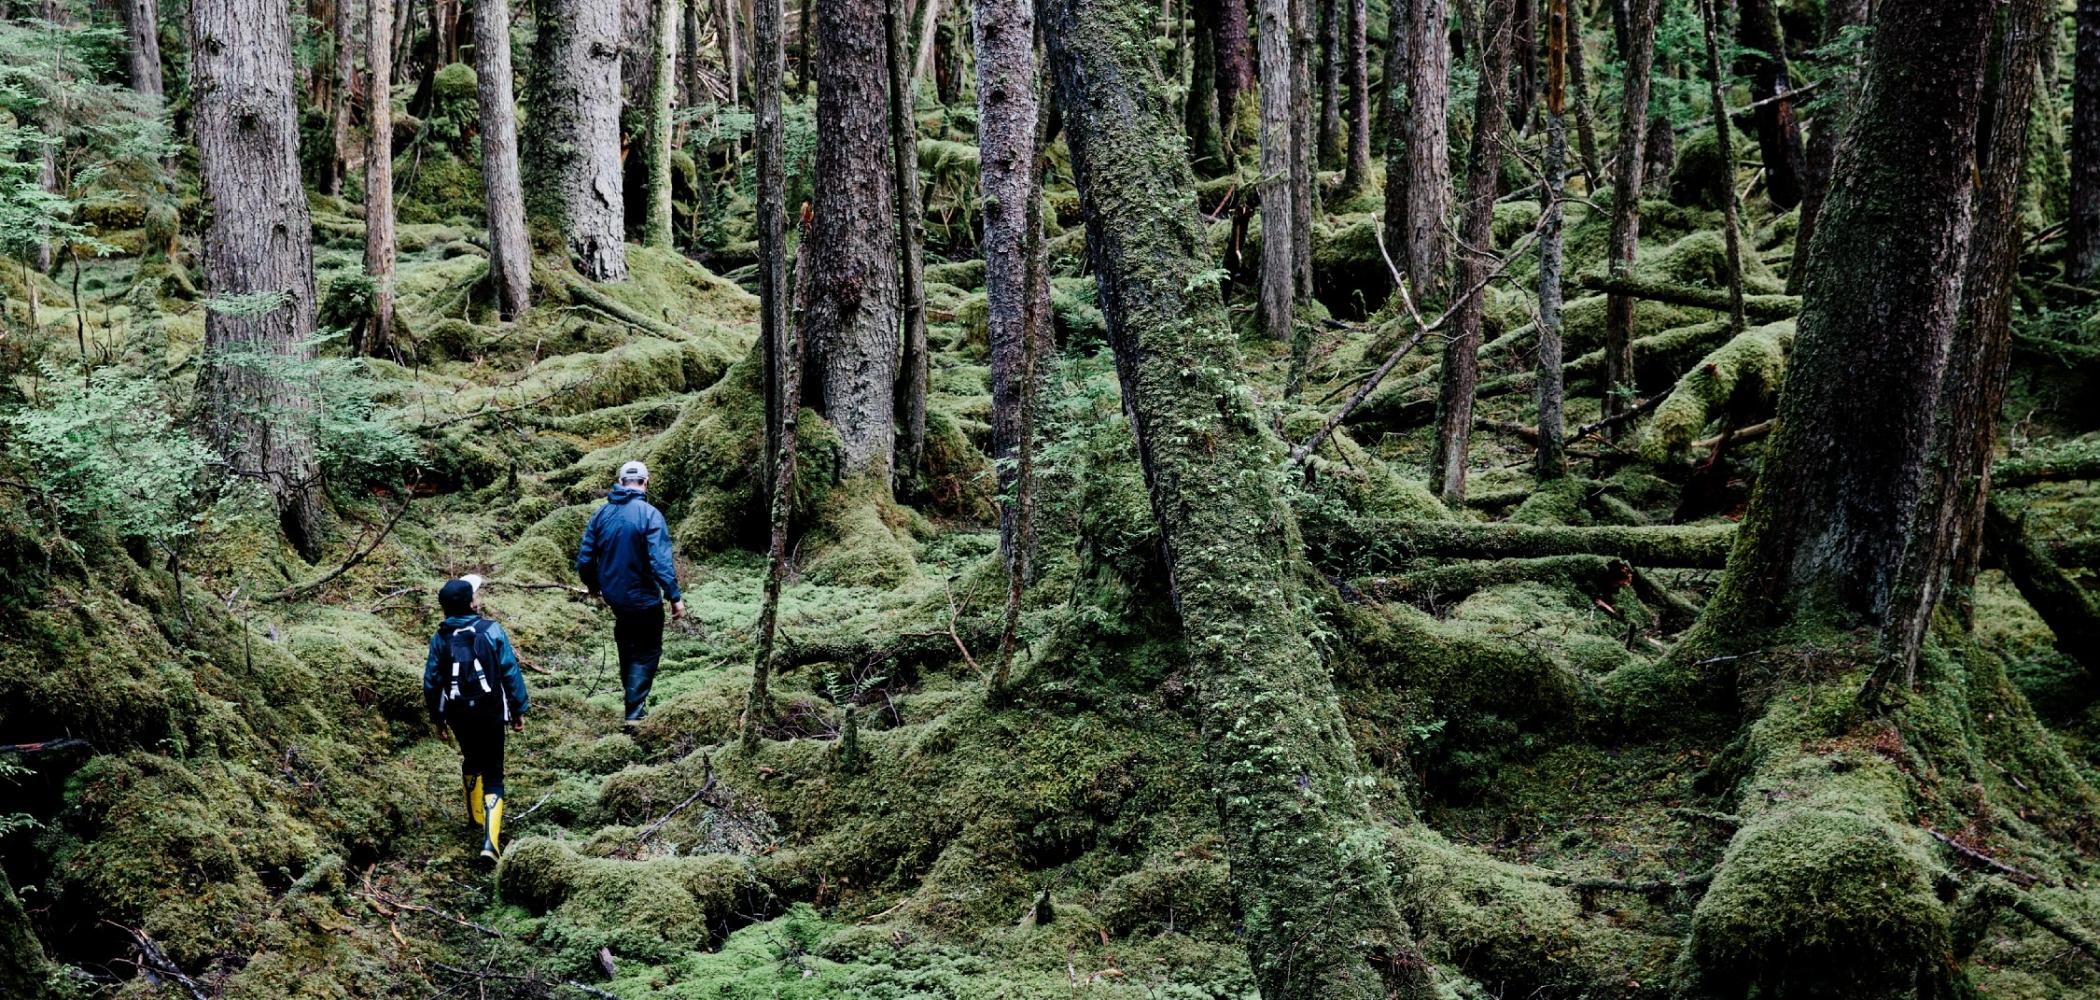 Two hikers hiking through tall trees in the Haida Gwaii